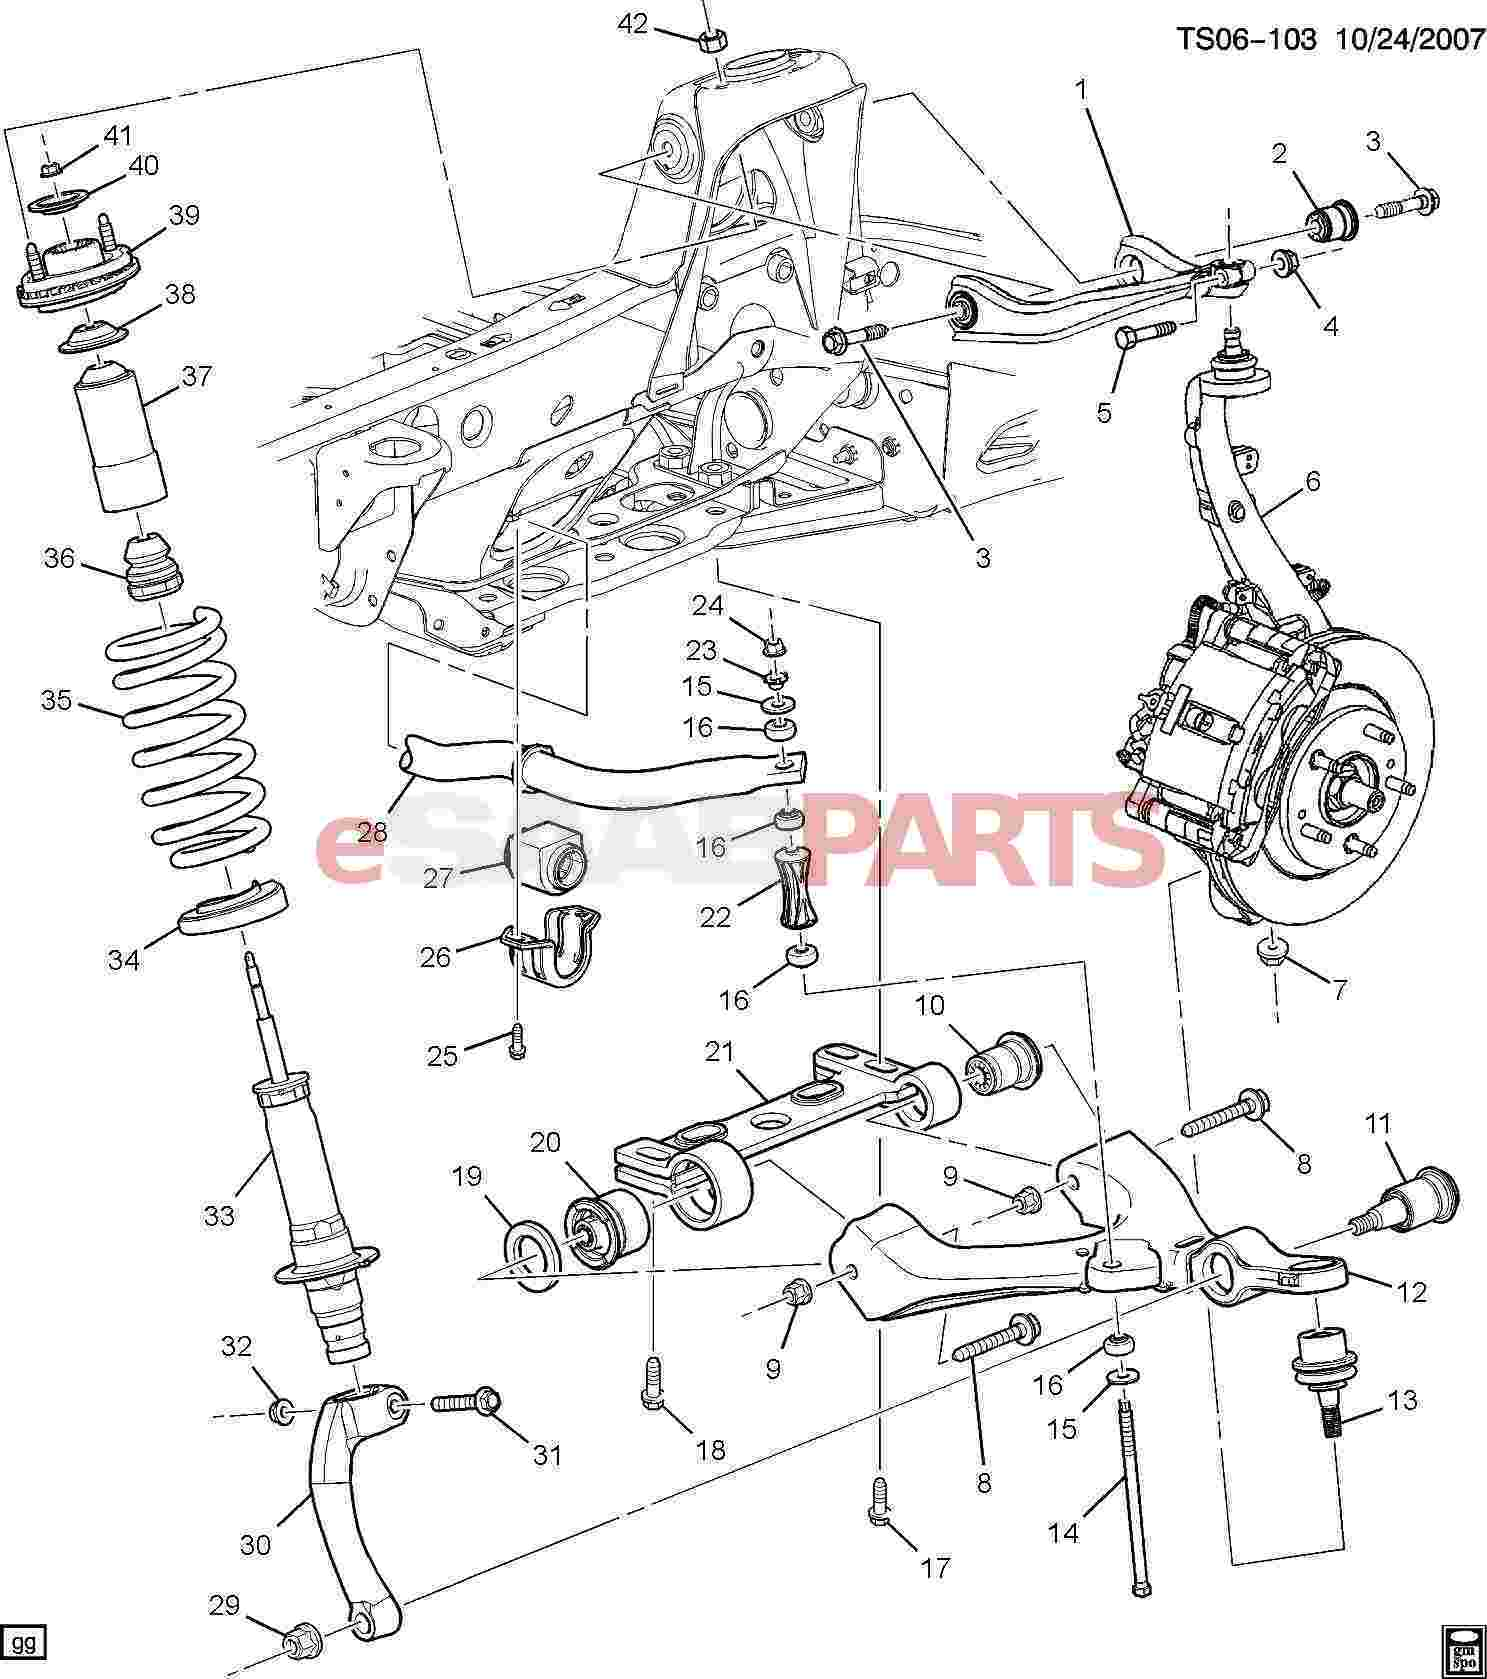 VG_6801] Saab 2000 9 3 Engine Diagram Get Free Image About Wiring Diagram  Download DiagramWeveq Xaem Mohammedshrine Librar Wiring 101